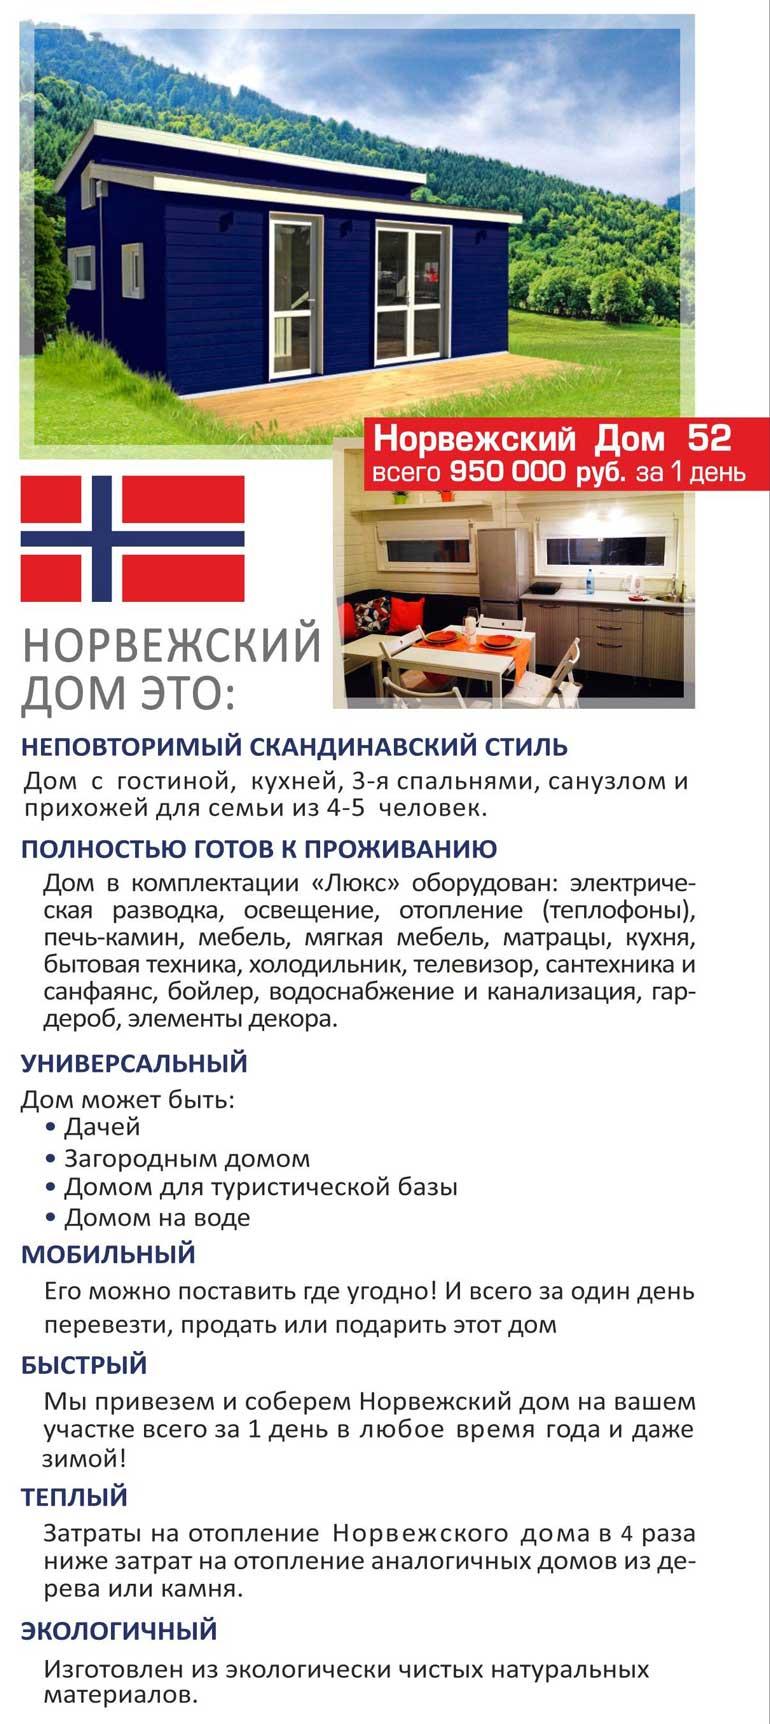 norvezhskiy-dom-52-modum-za-1-den